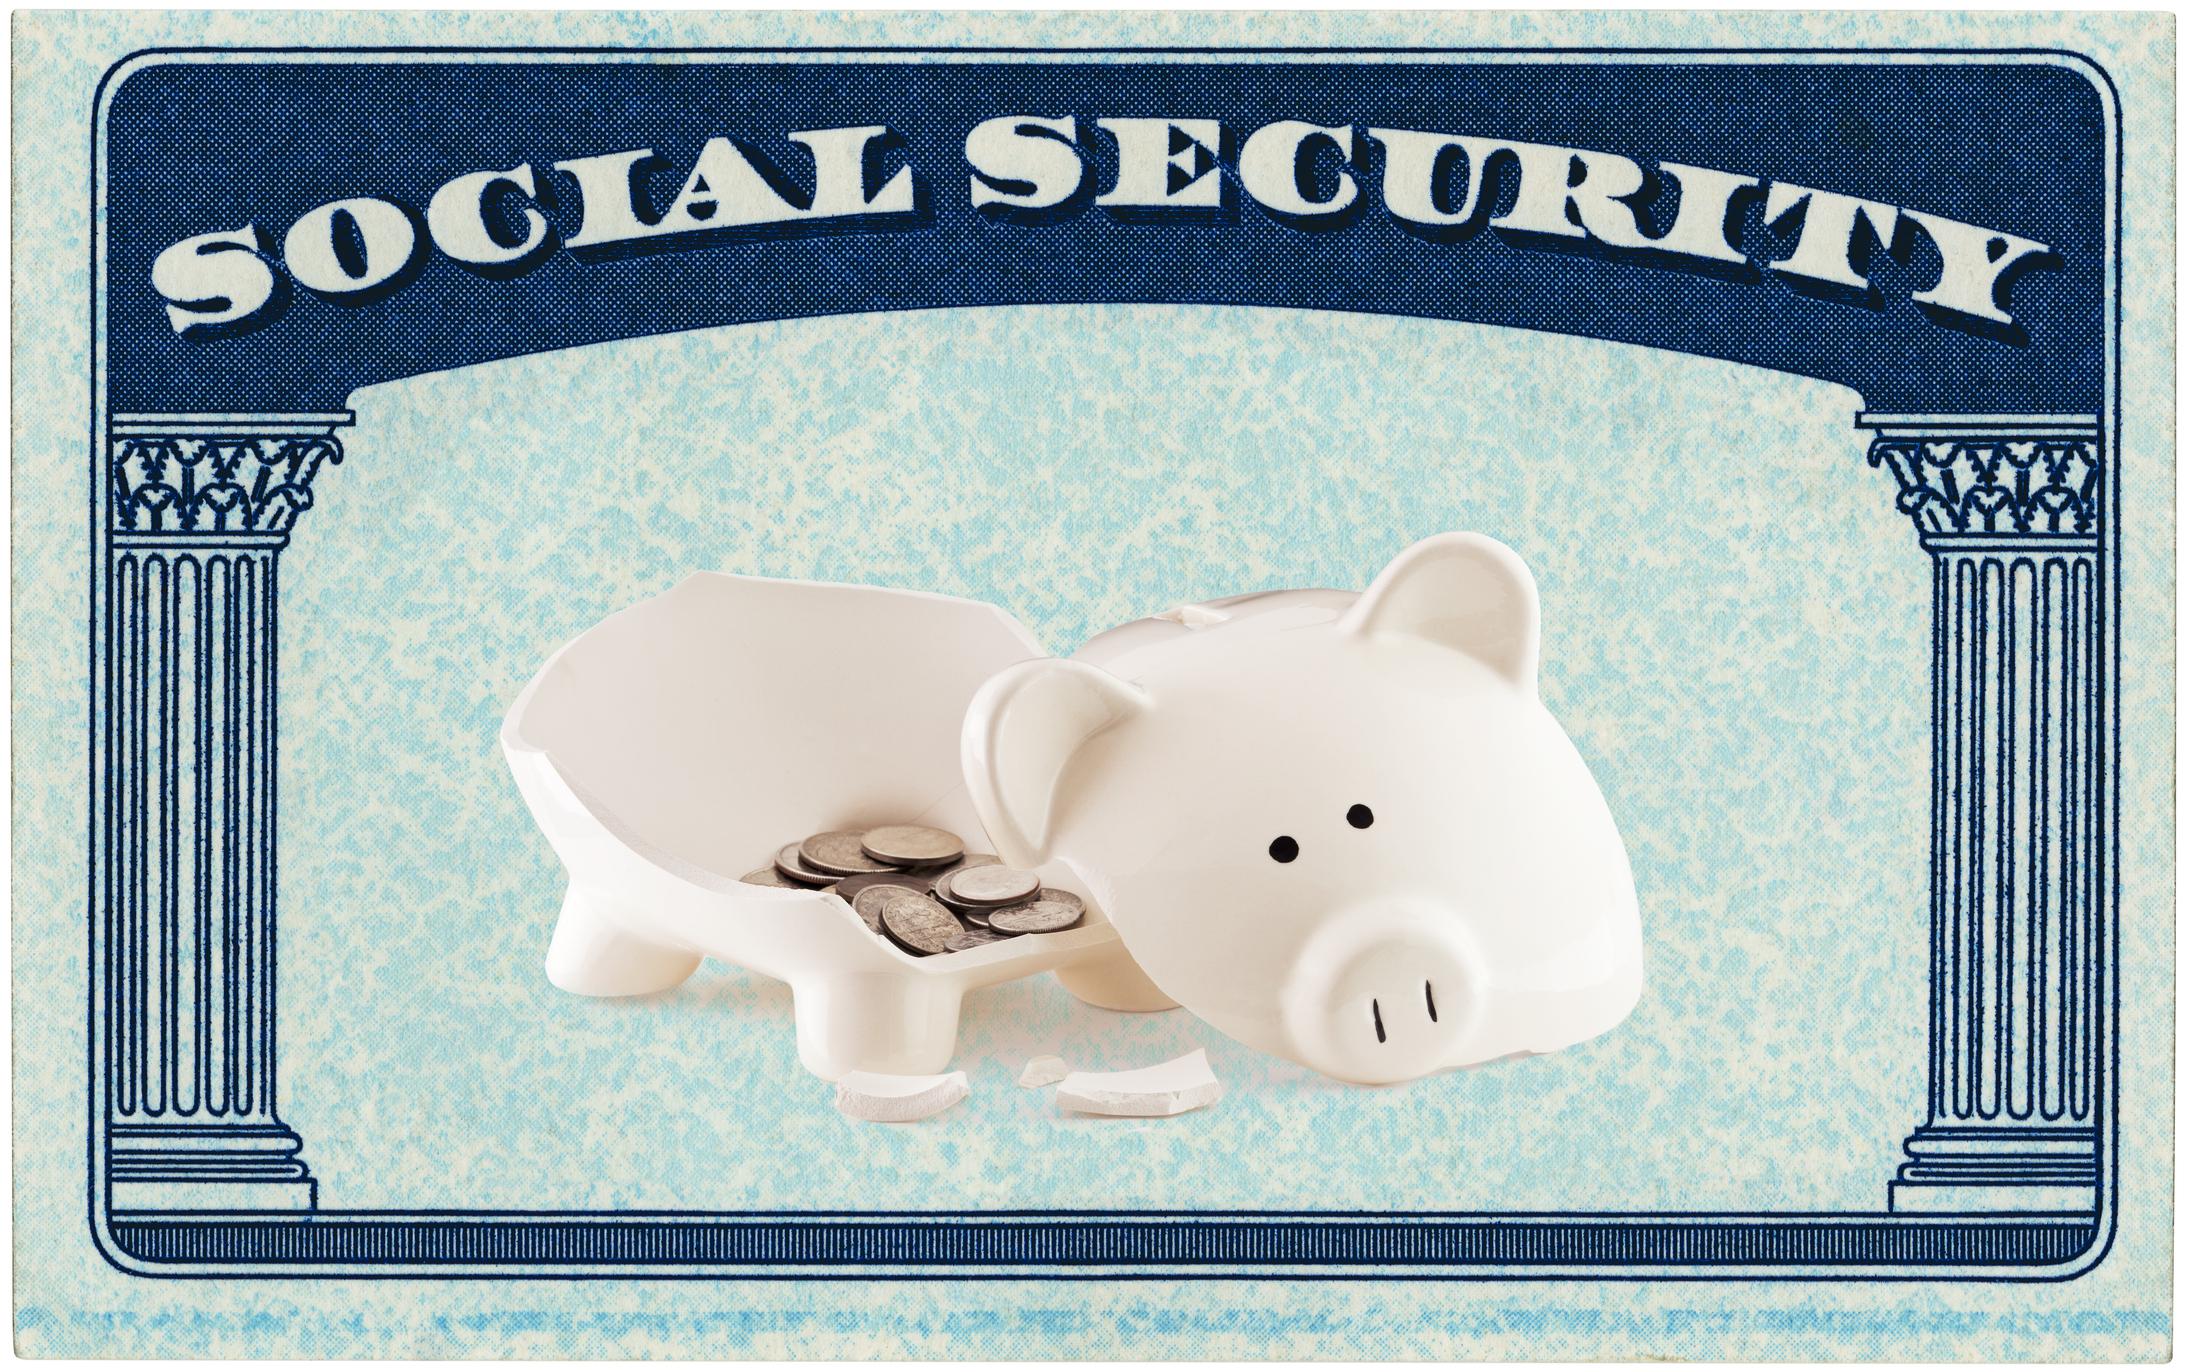 Broken piggy bank inside a Social Security card